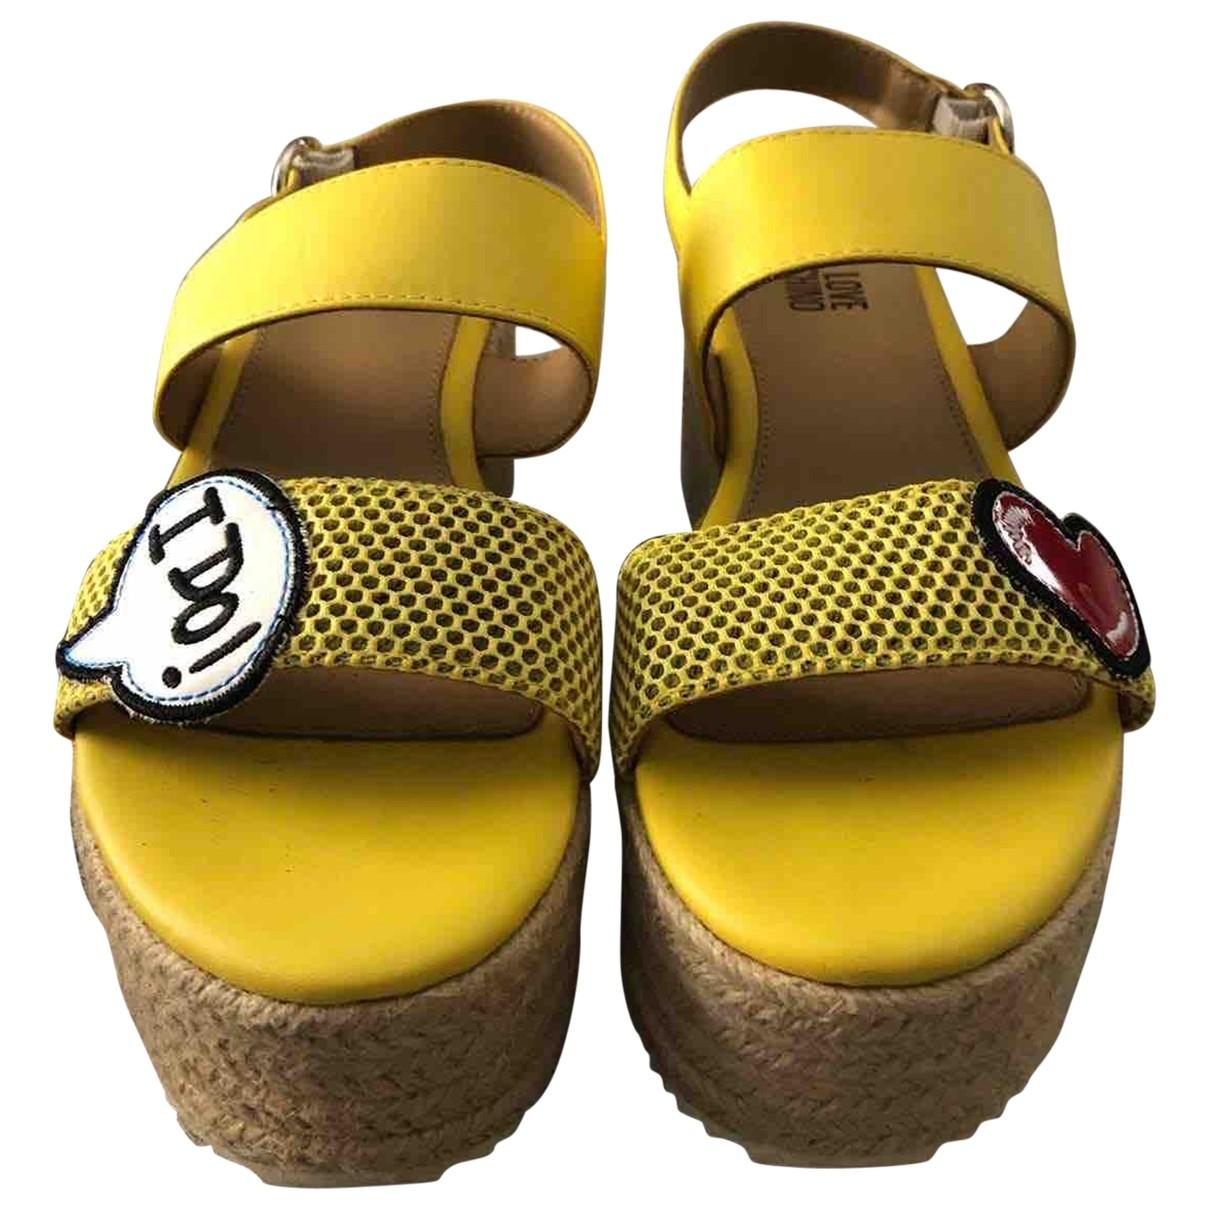 Sandalias romanas de Cuero Moschino Love